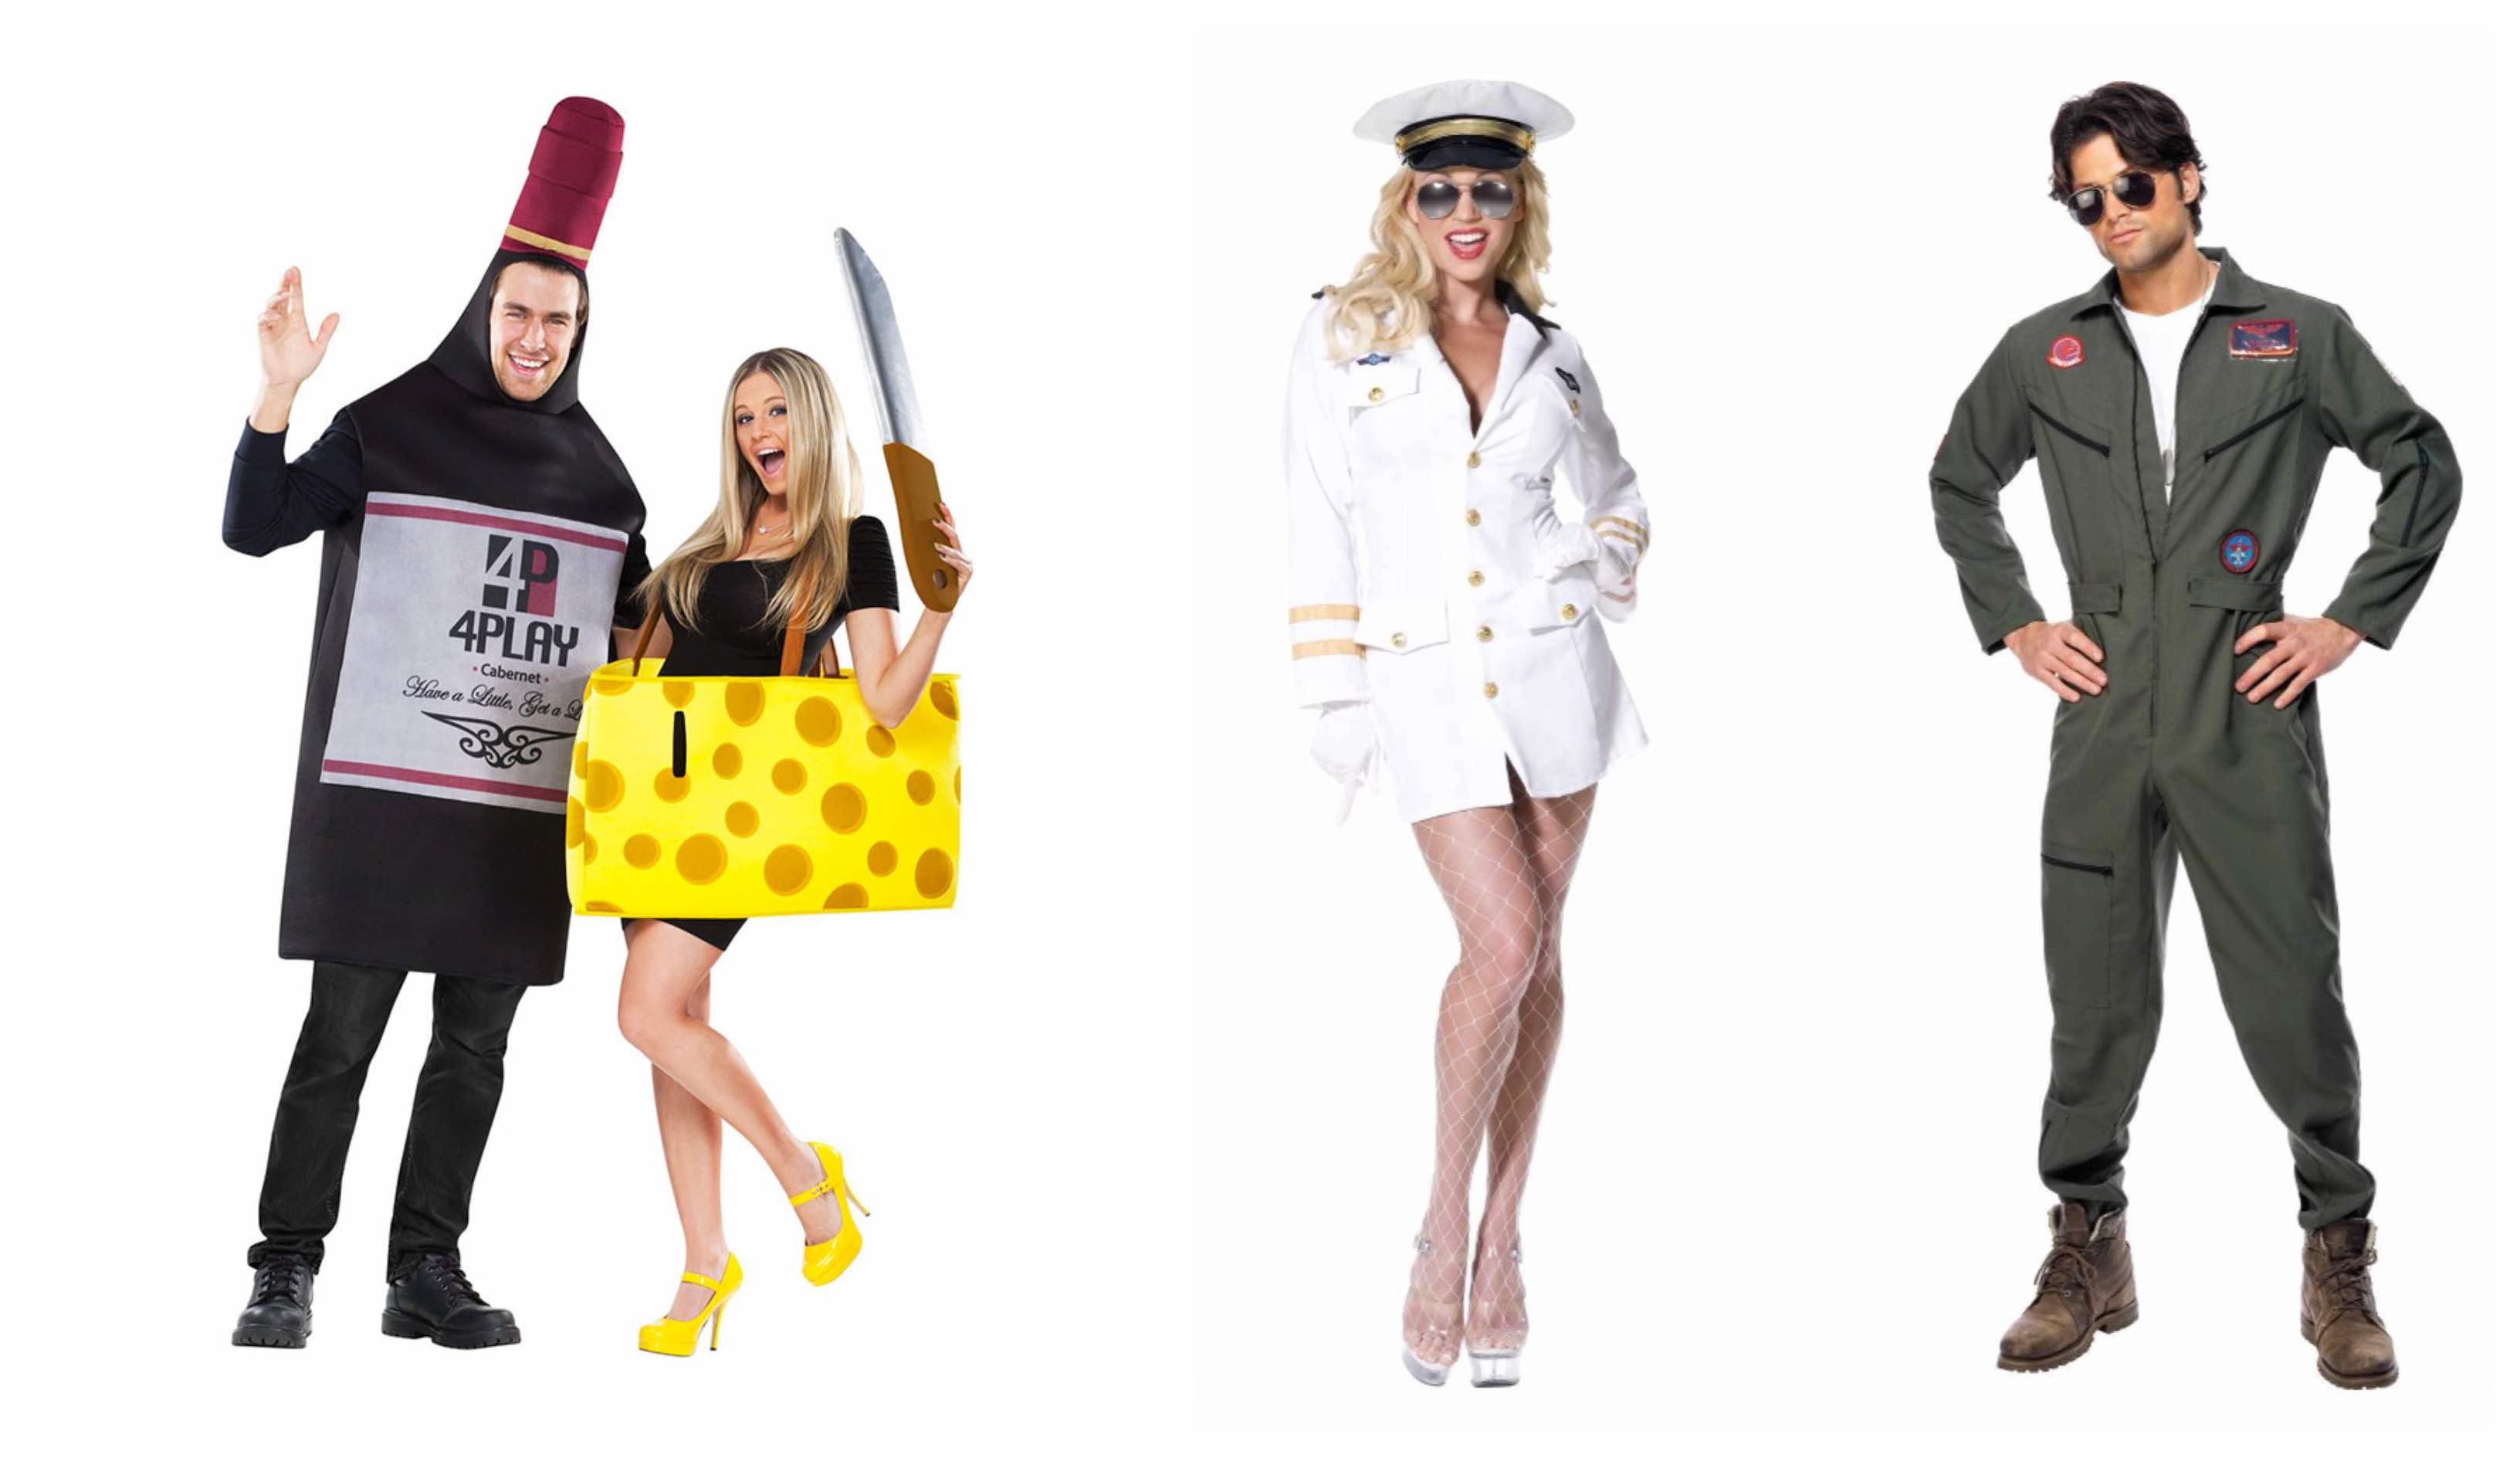 Par kostumer til voksne - KostumeUniverset 61704f0113c72